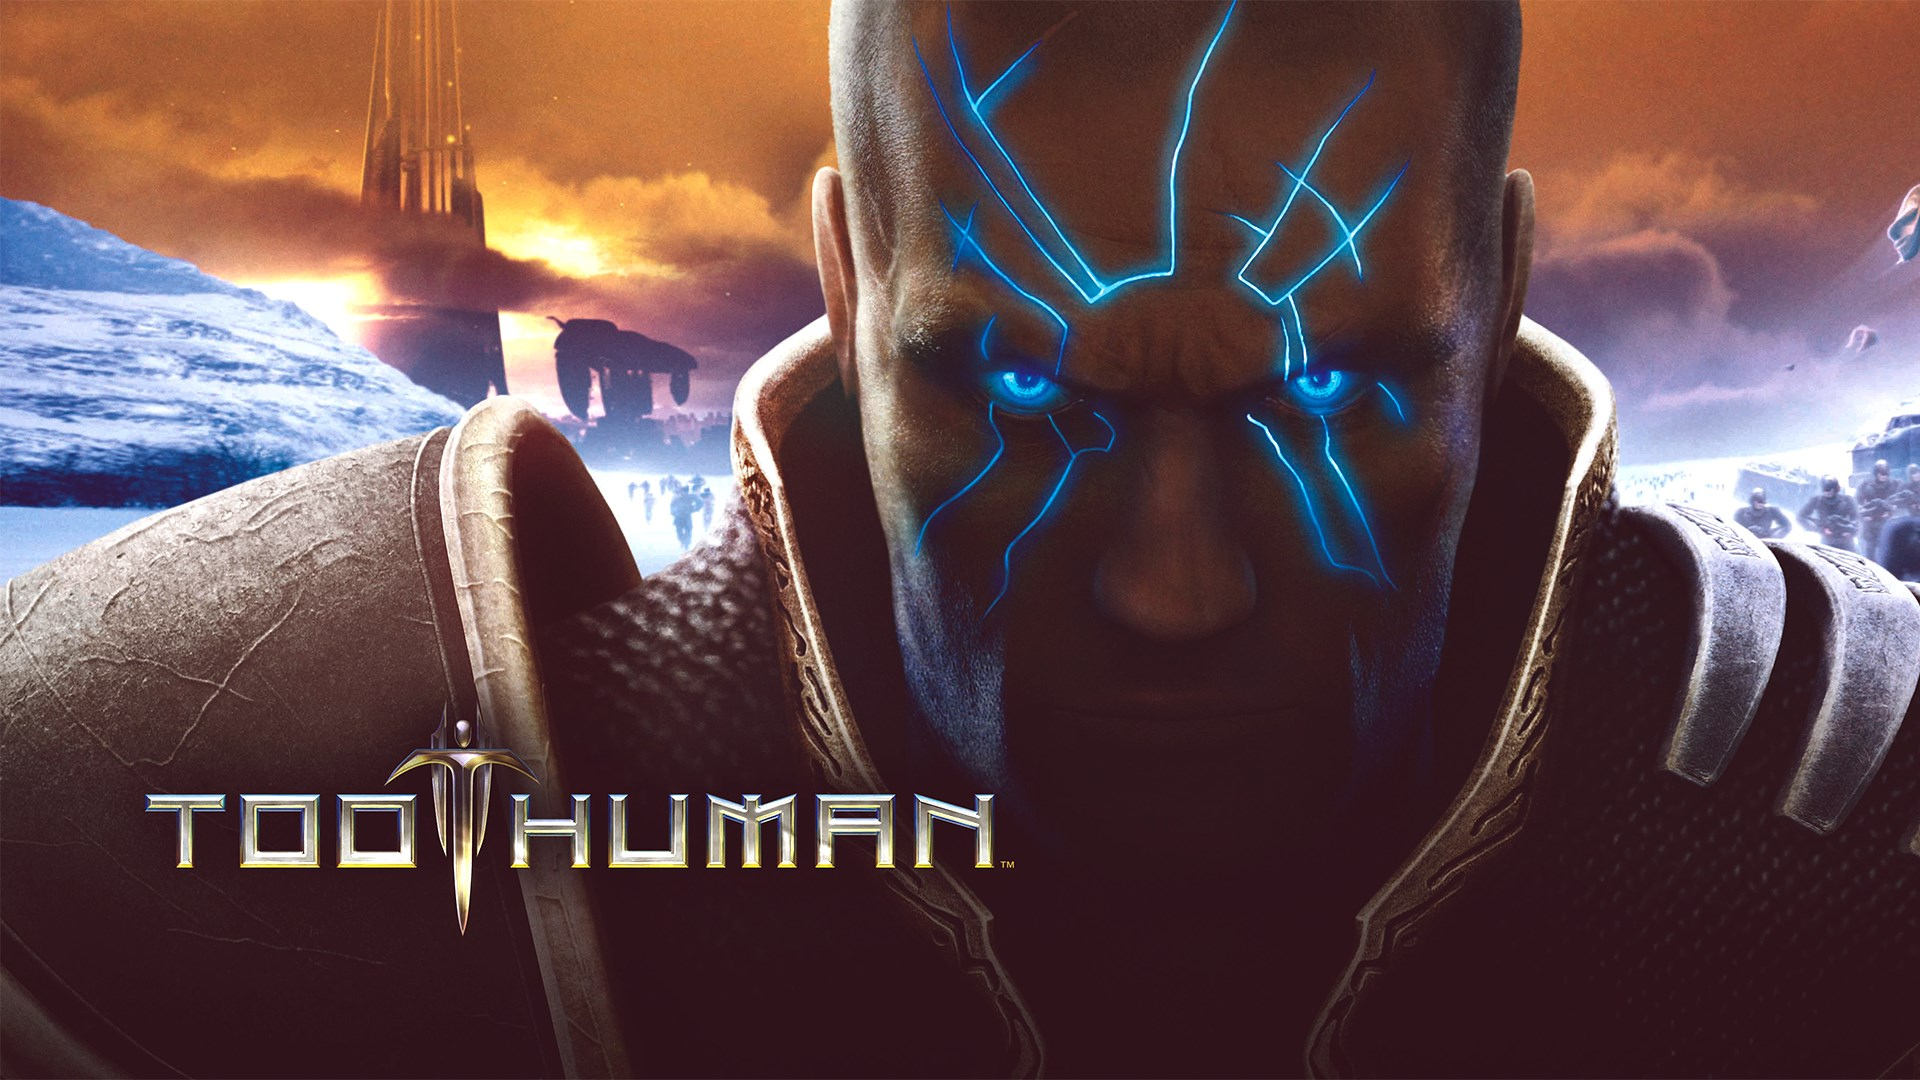 Too Human Pre-Order Armor Sets